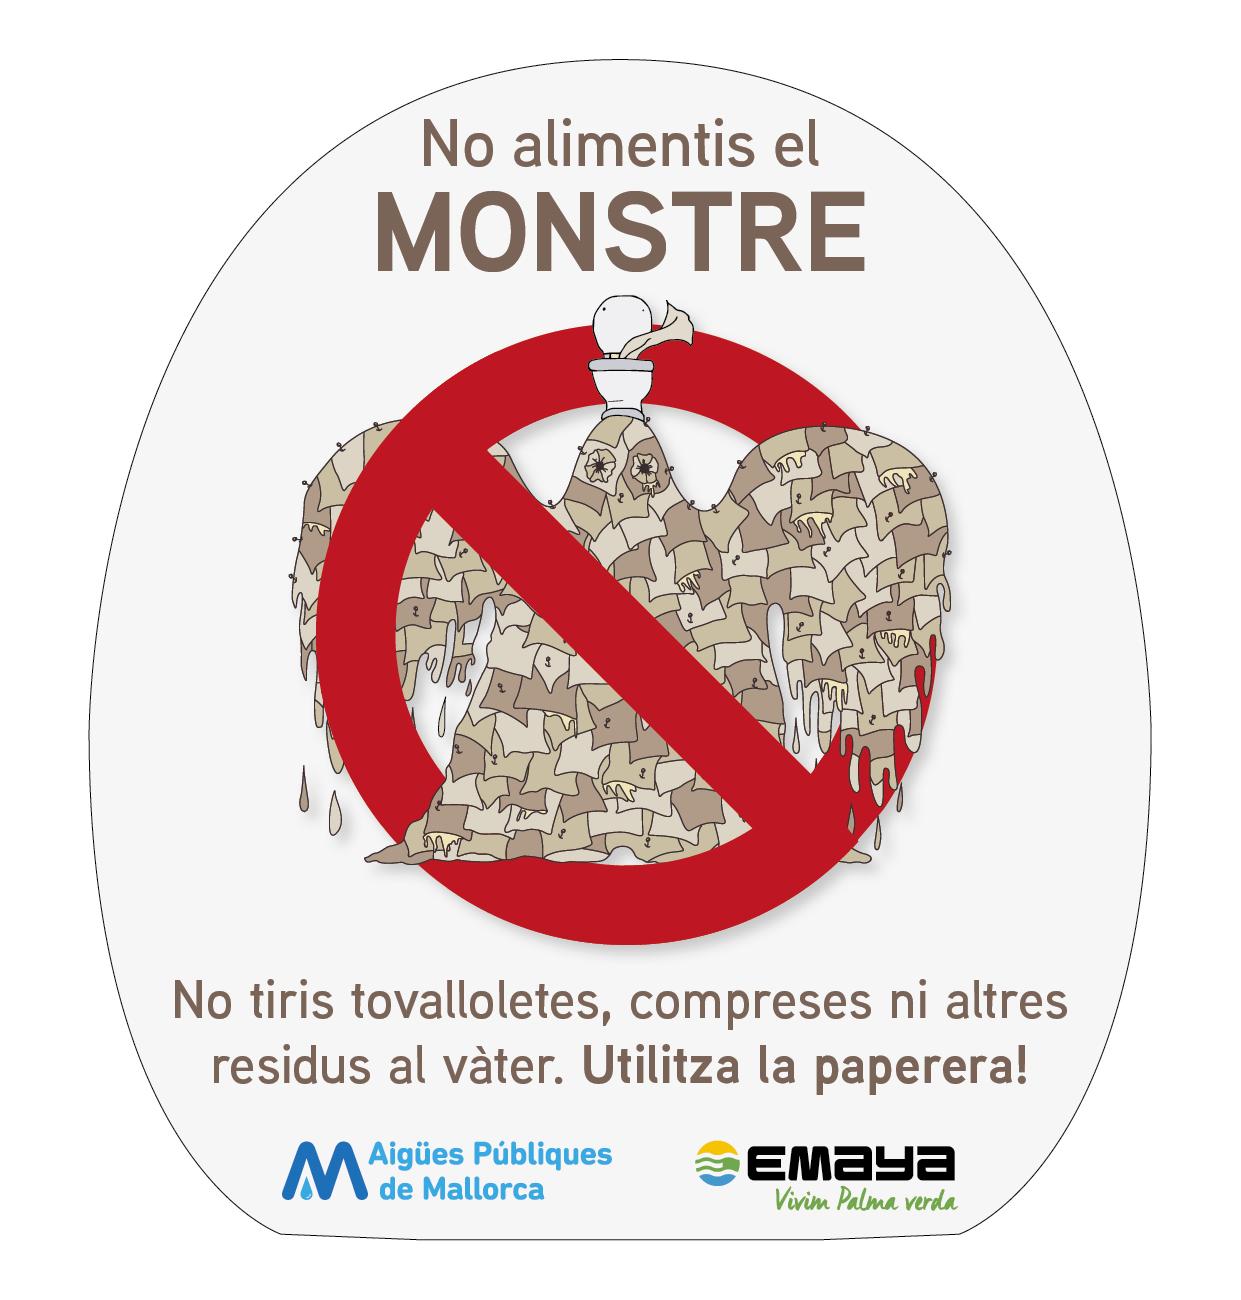 https://www.emaya.es/media/6401/adhesiu-monstre-cat.jpg